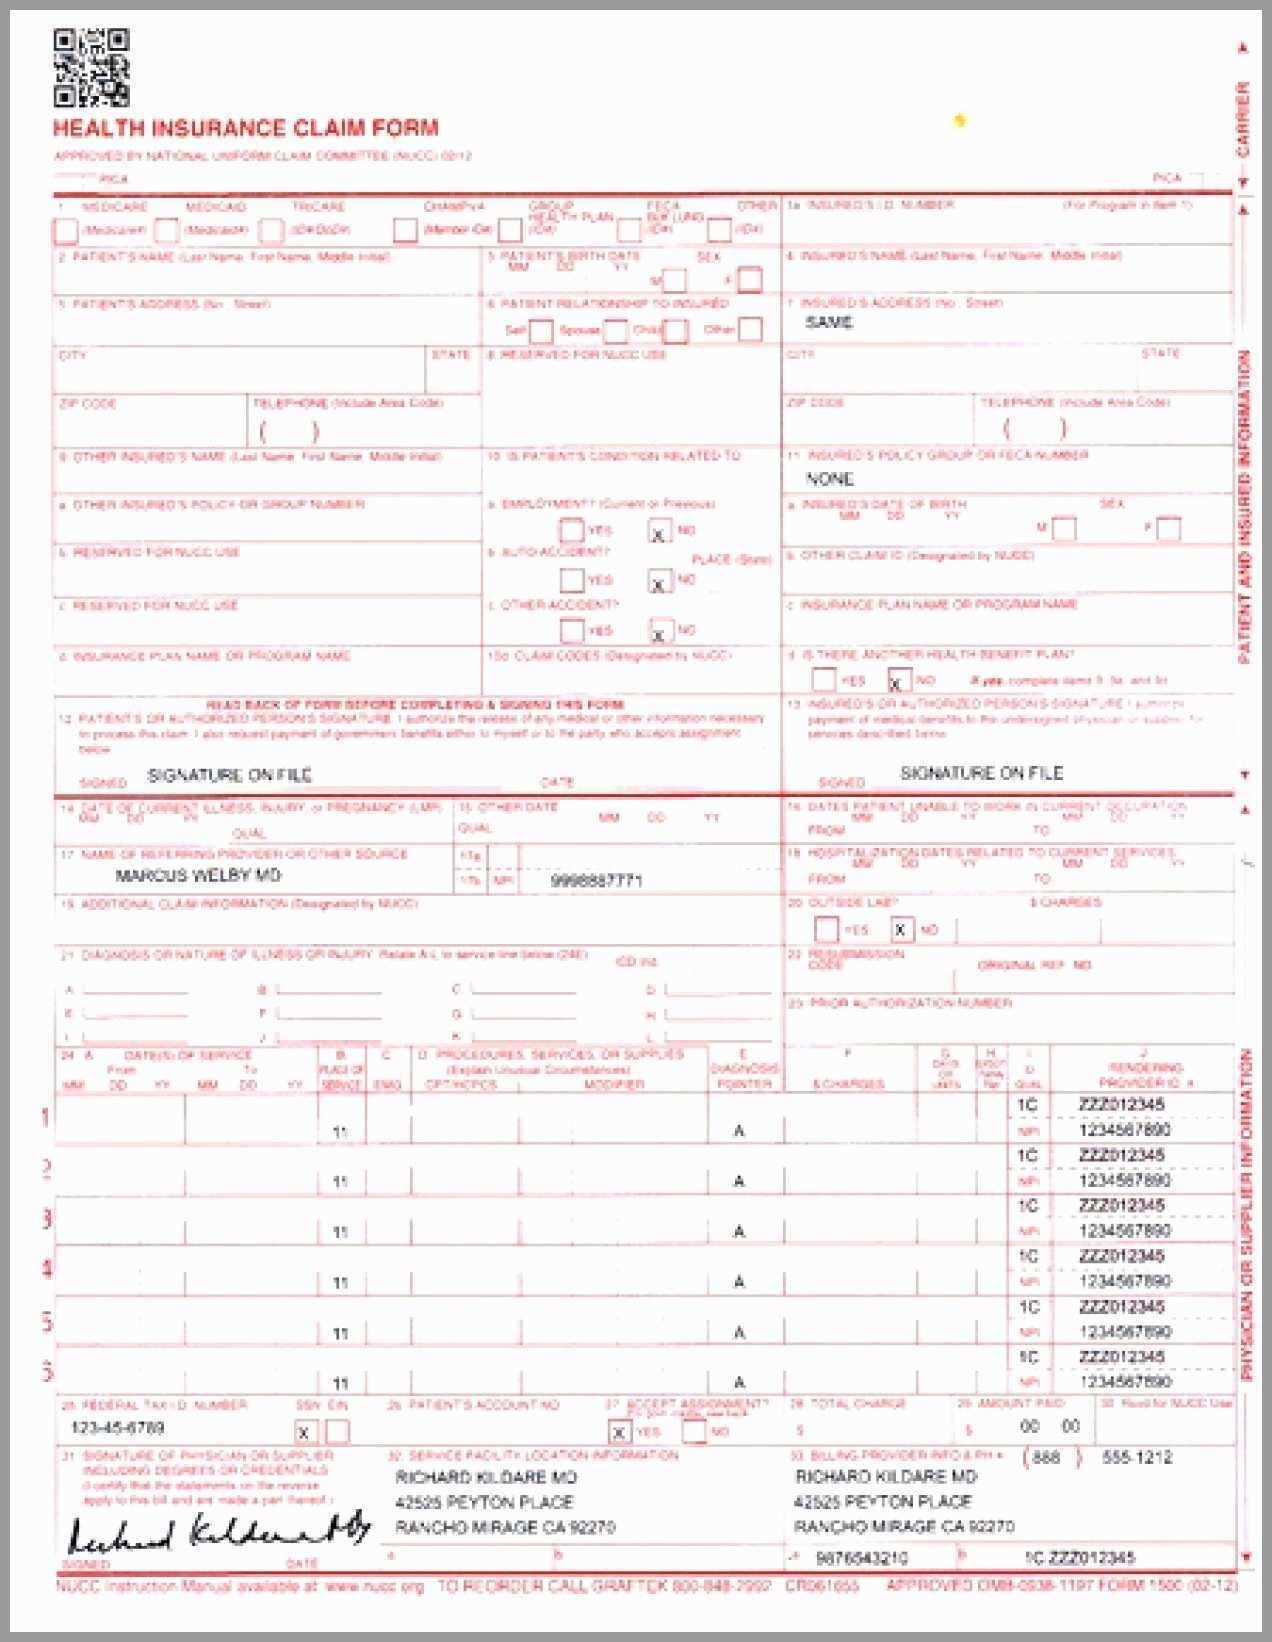 Hcfa 1500 Excel Template